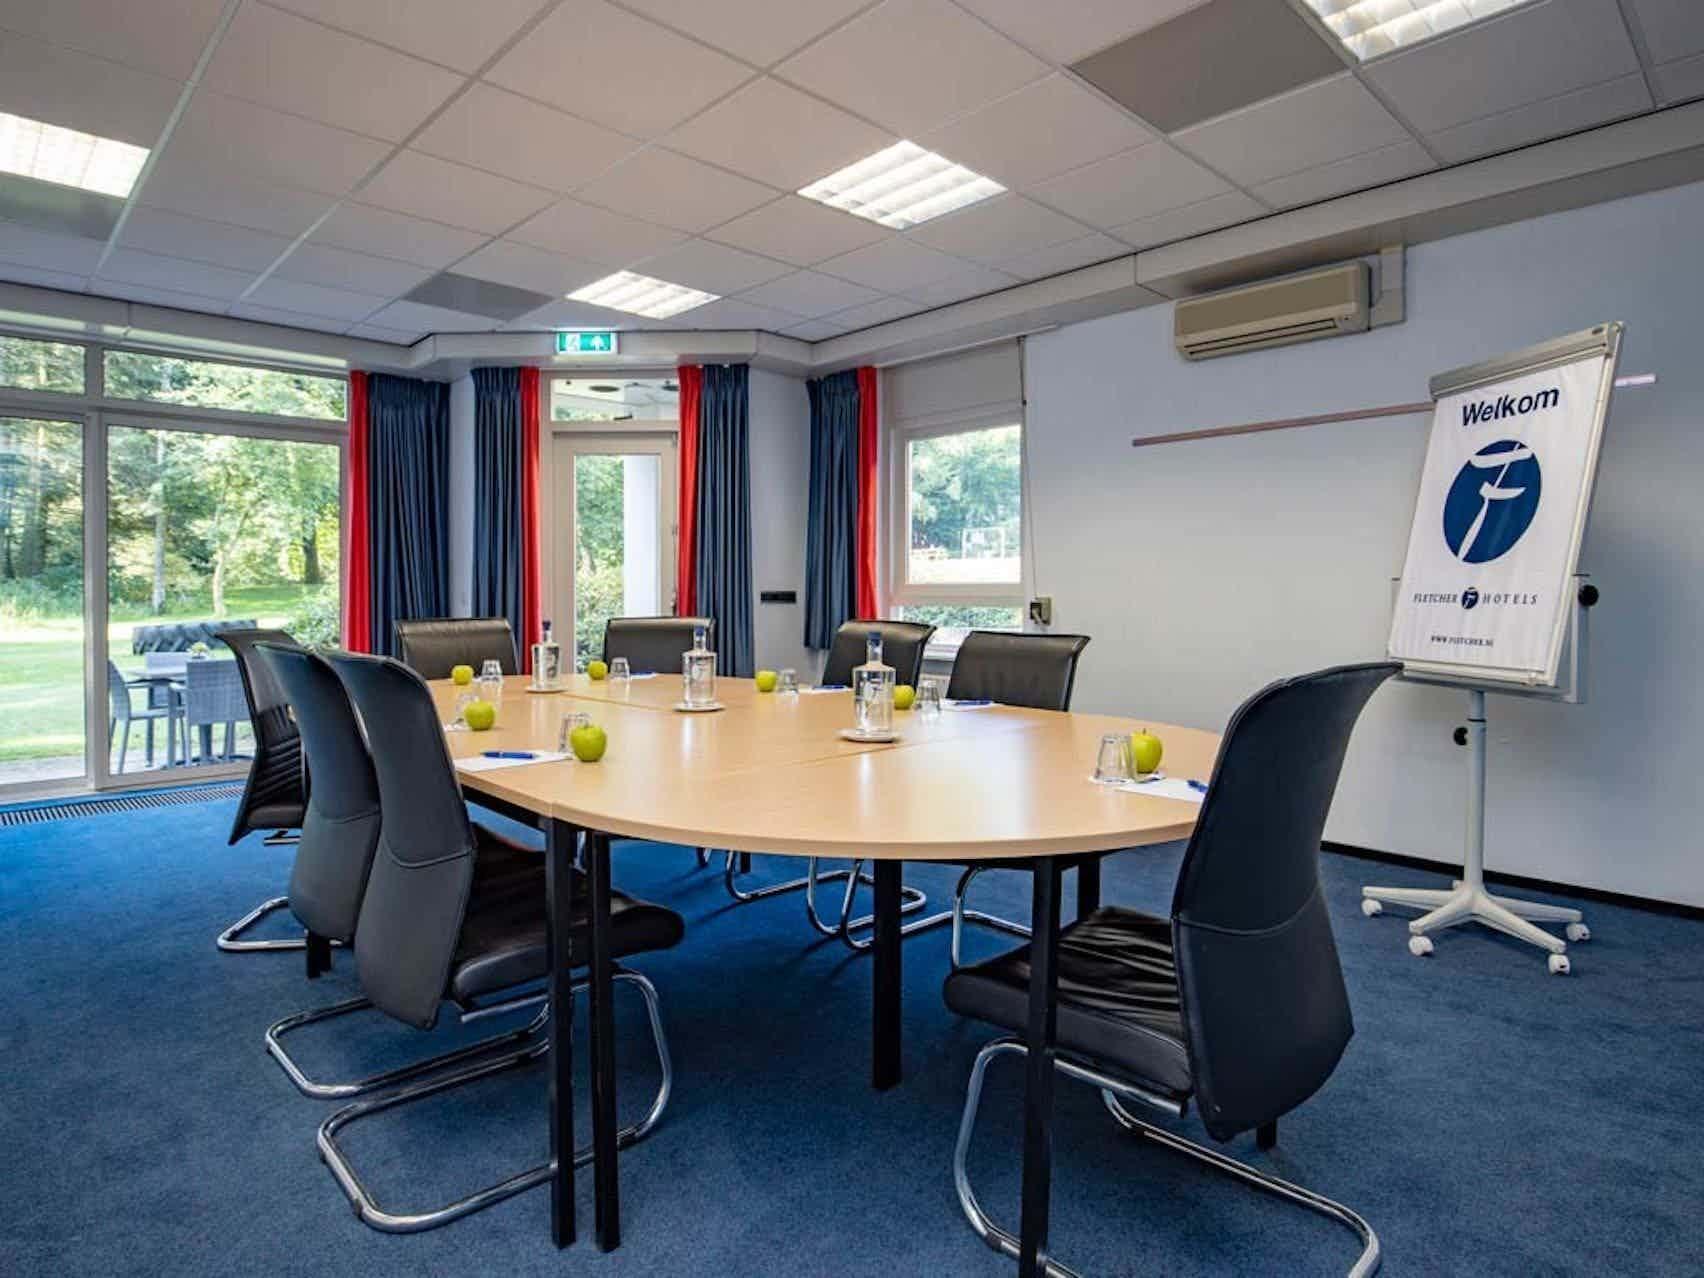 Meeting Room 1, Fletcher Hotels - Amersfoort